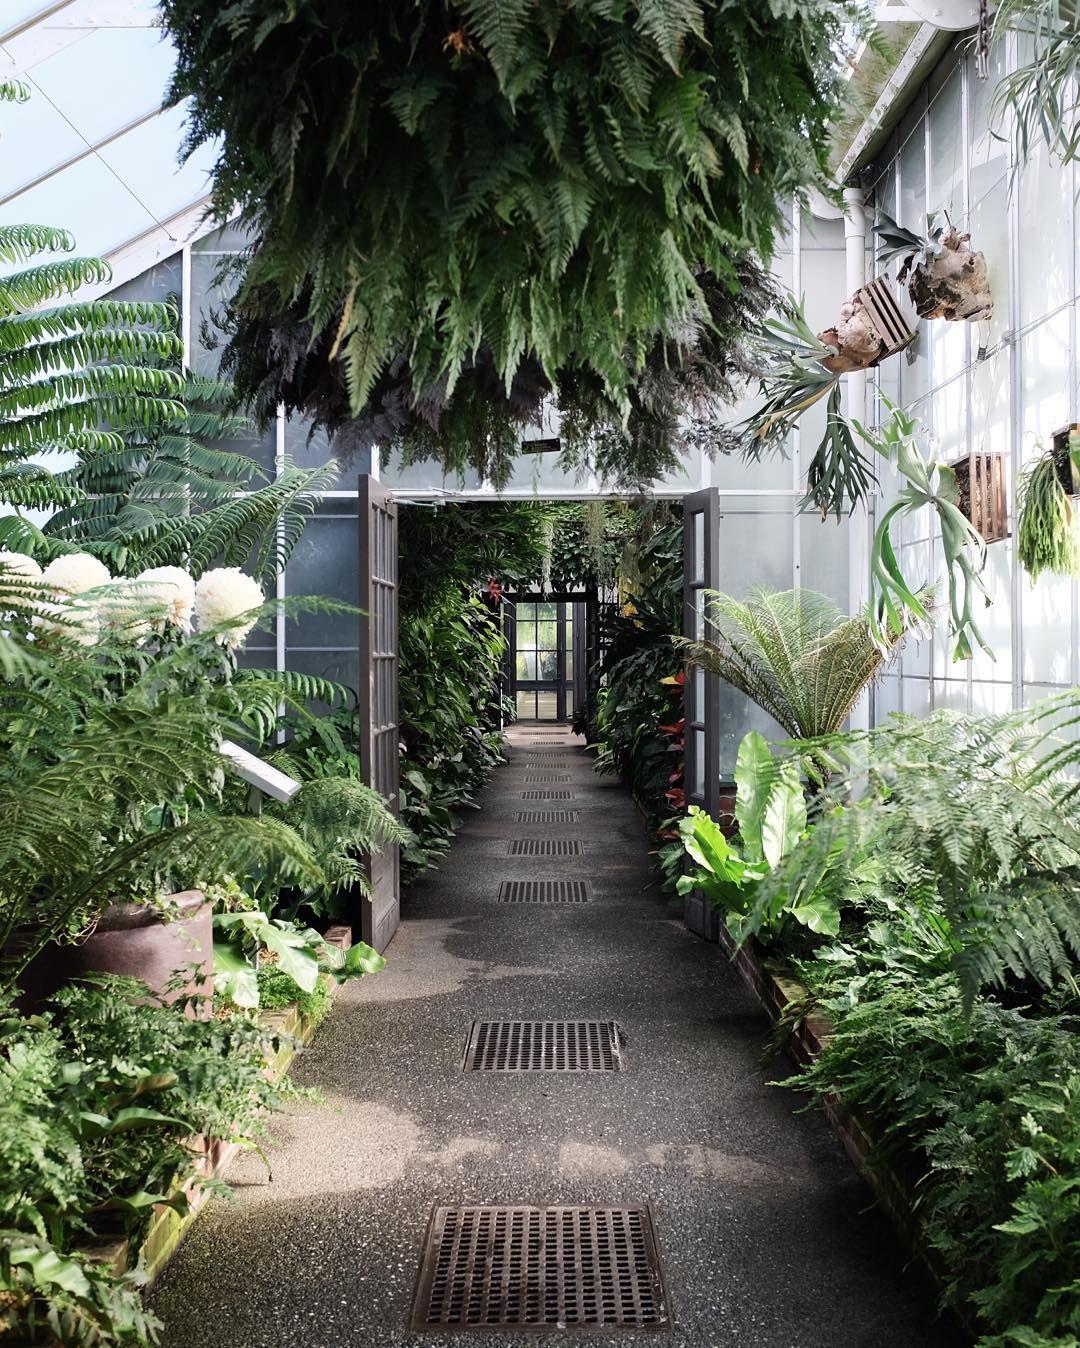 Conservatory Dreams At Longwood Gardens Near Philadelphia (Photo By  @billycress On Instagram)